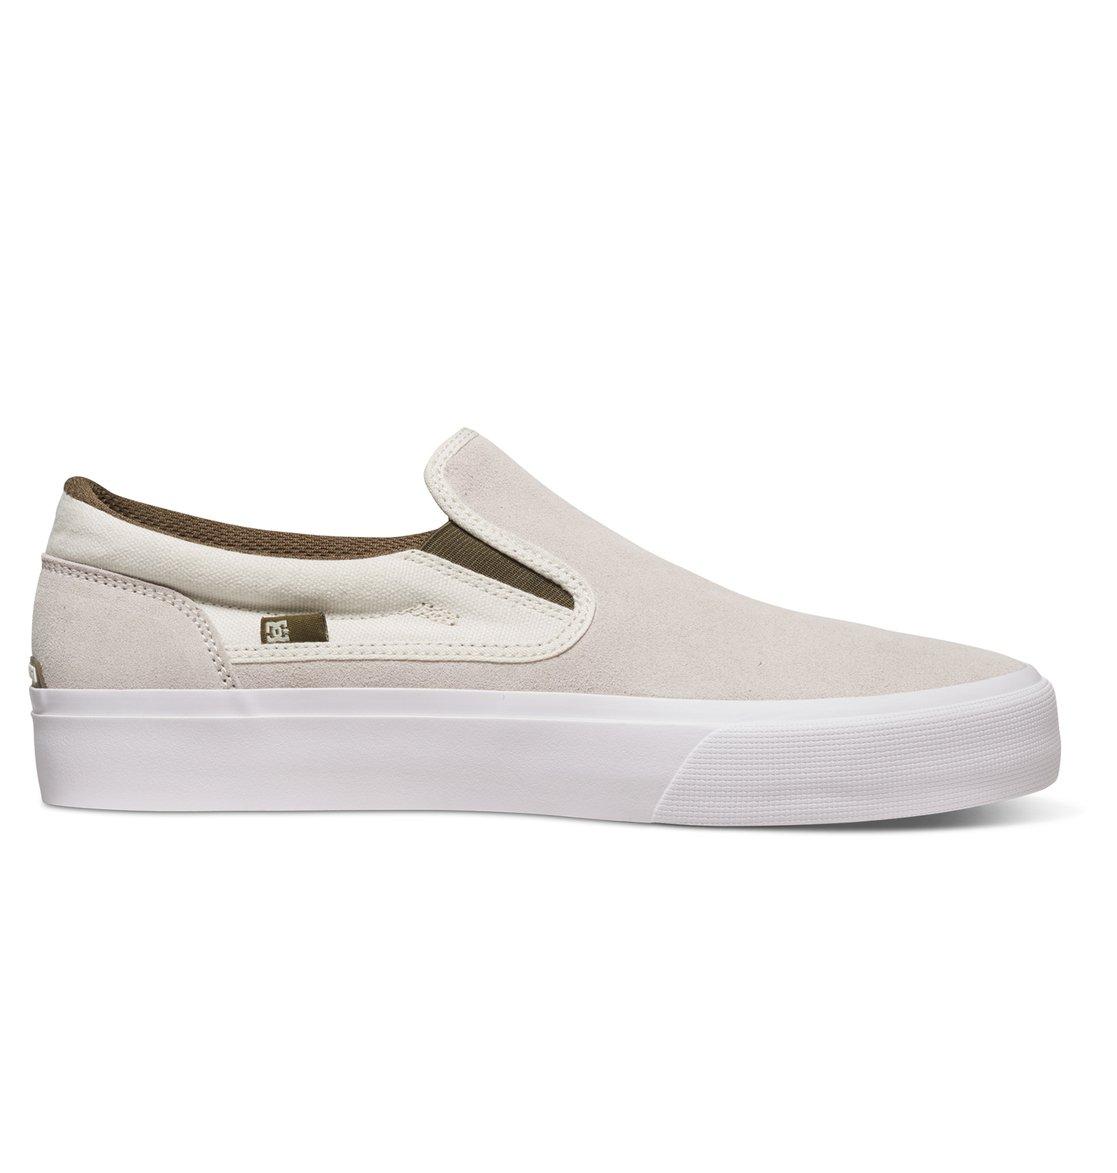 Adys300371 Trase S Dc Shoes Slip On Skate xXYY1Pn